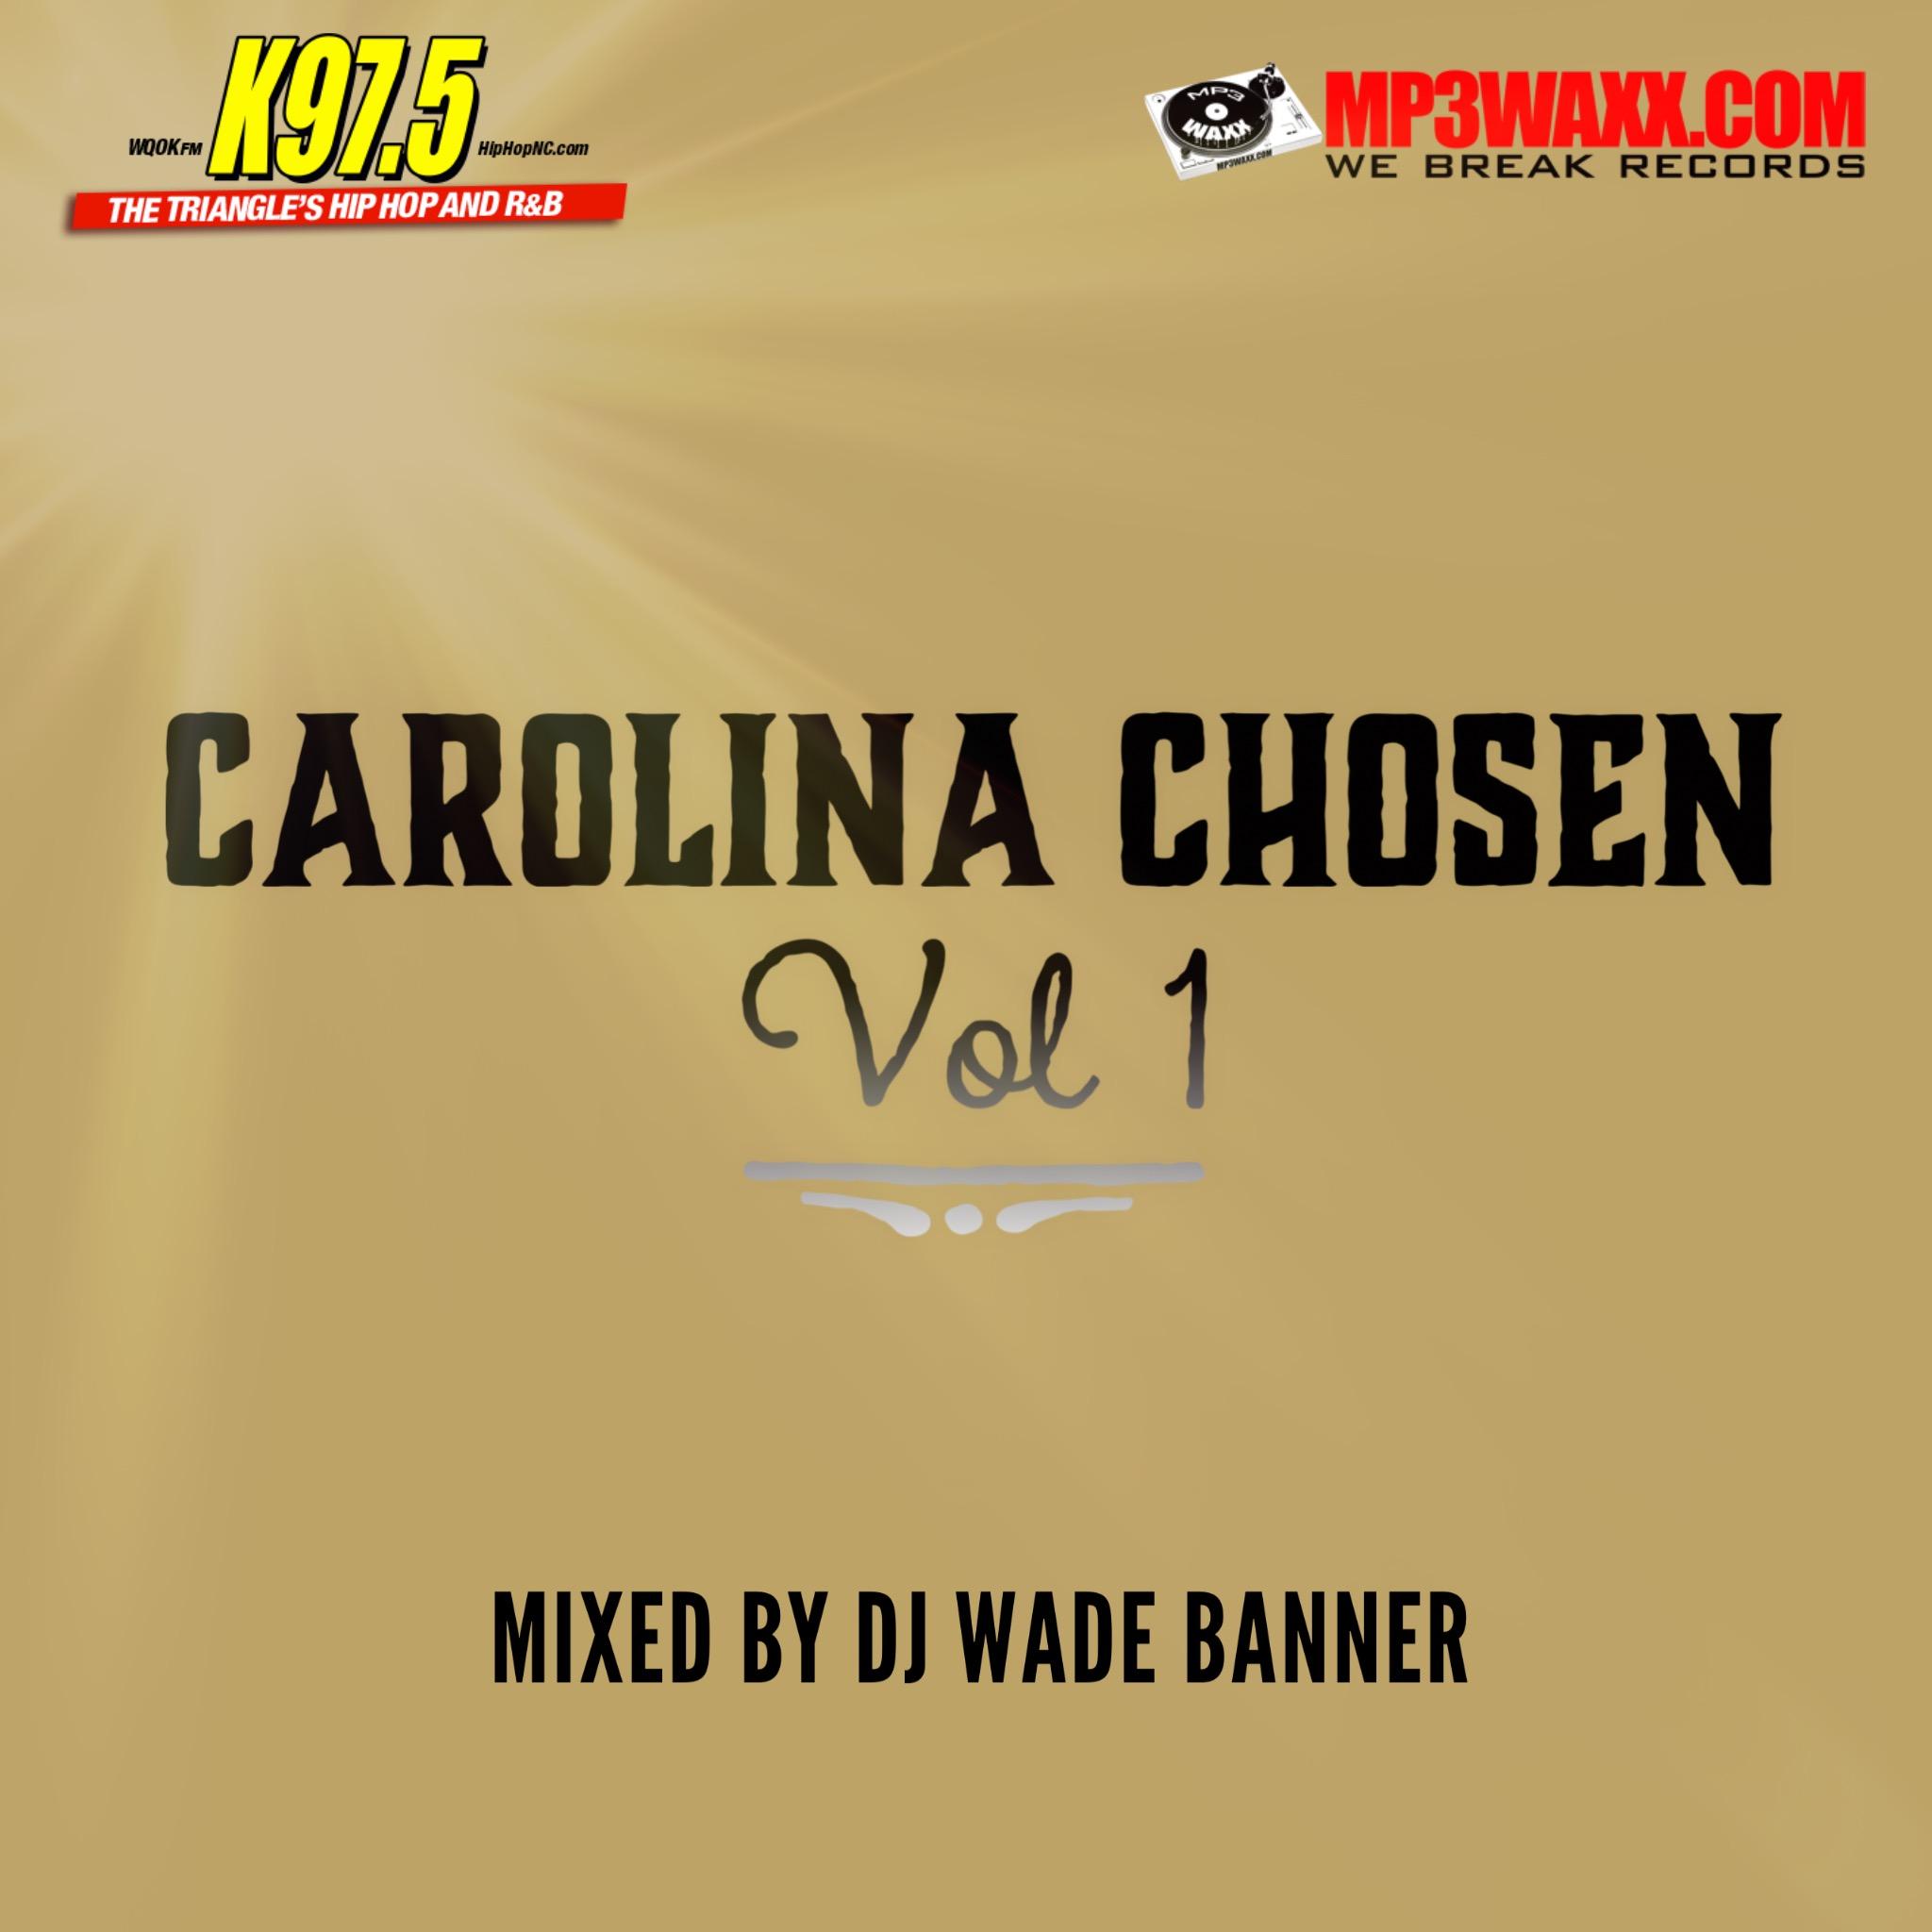 Carolina Chosen